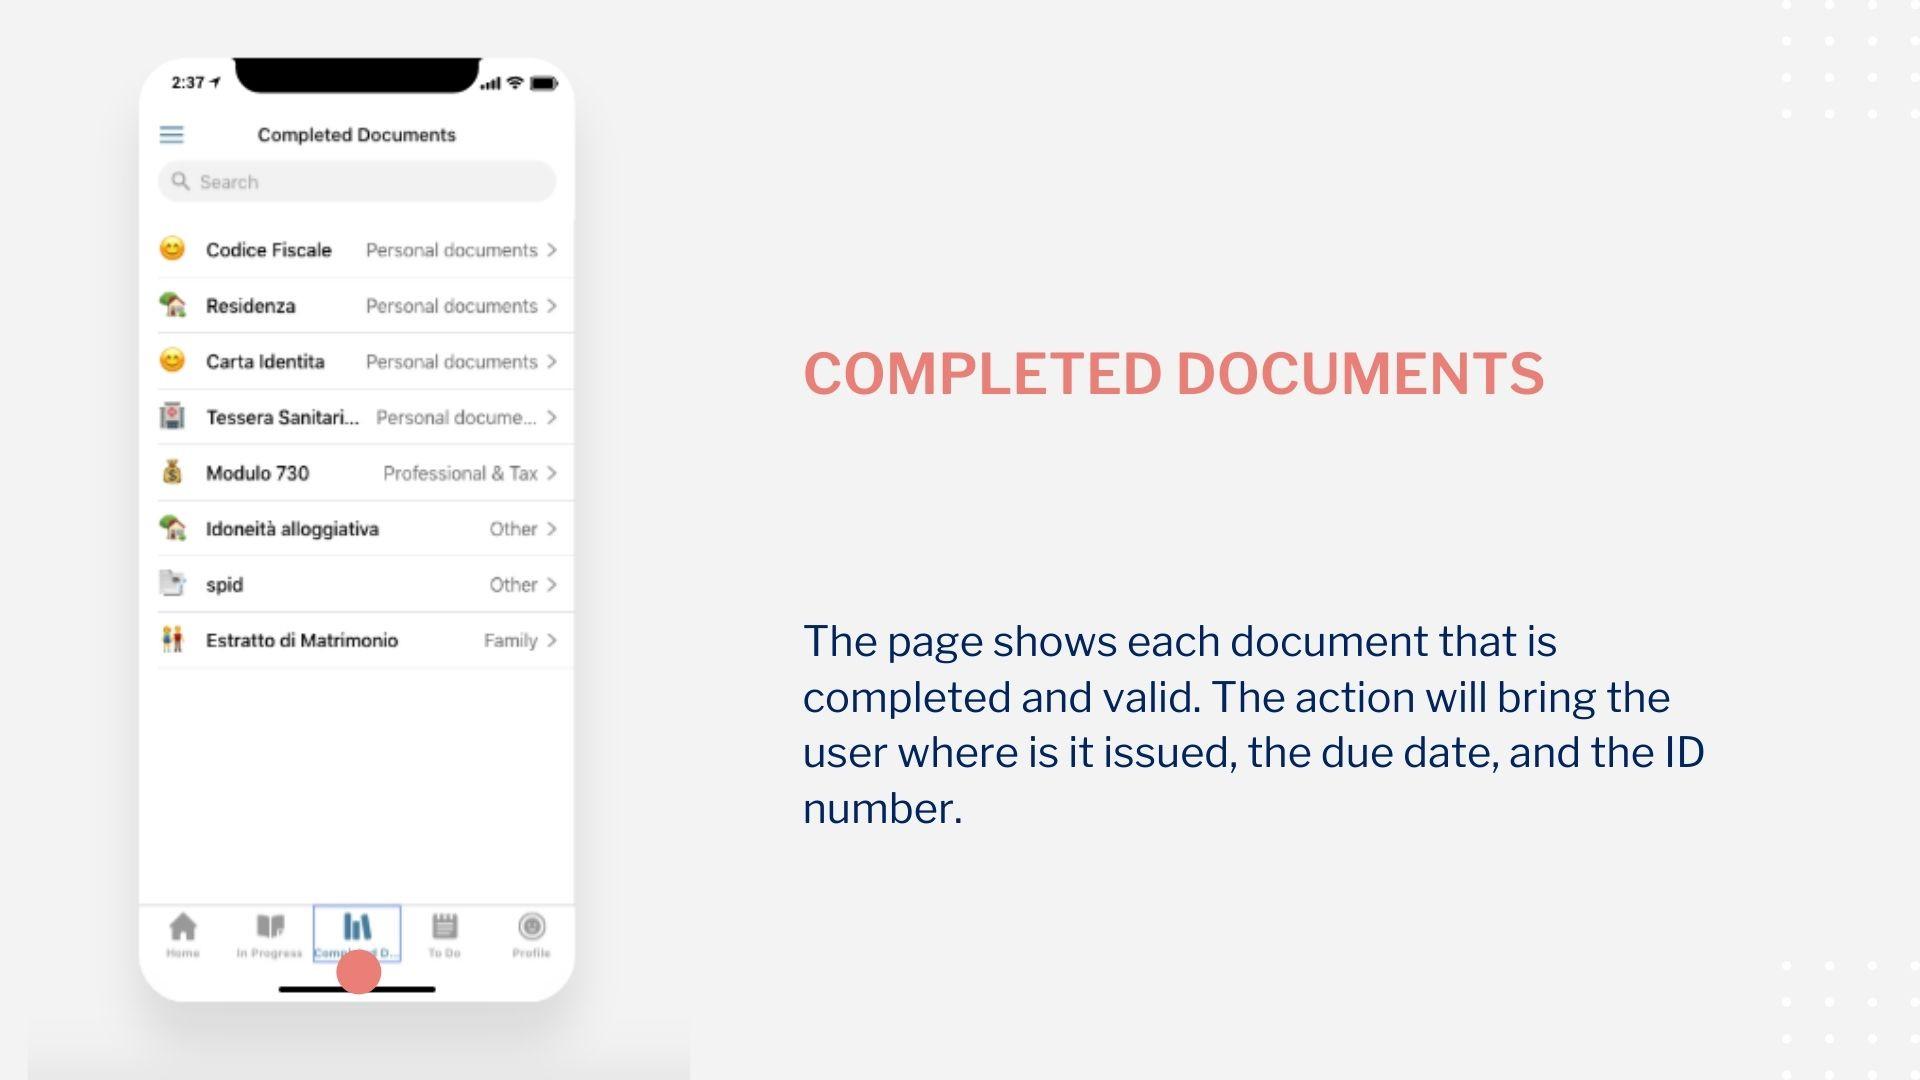 Startnieri screen completed documents